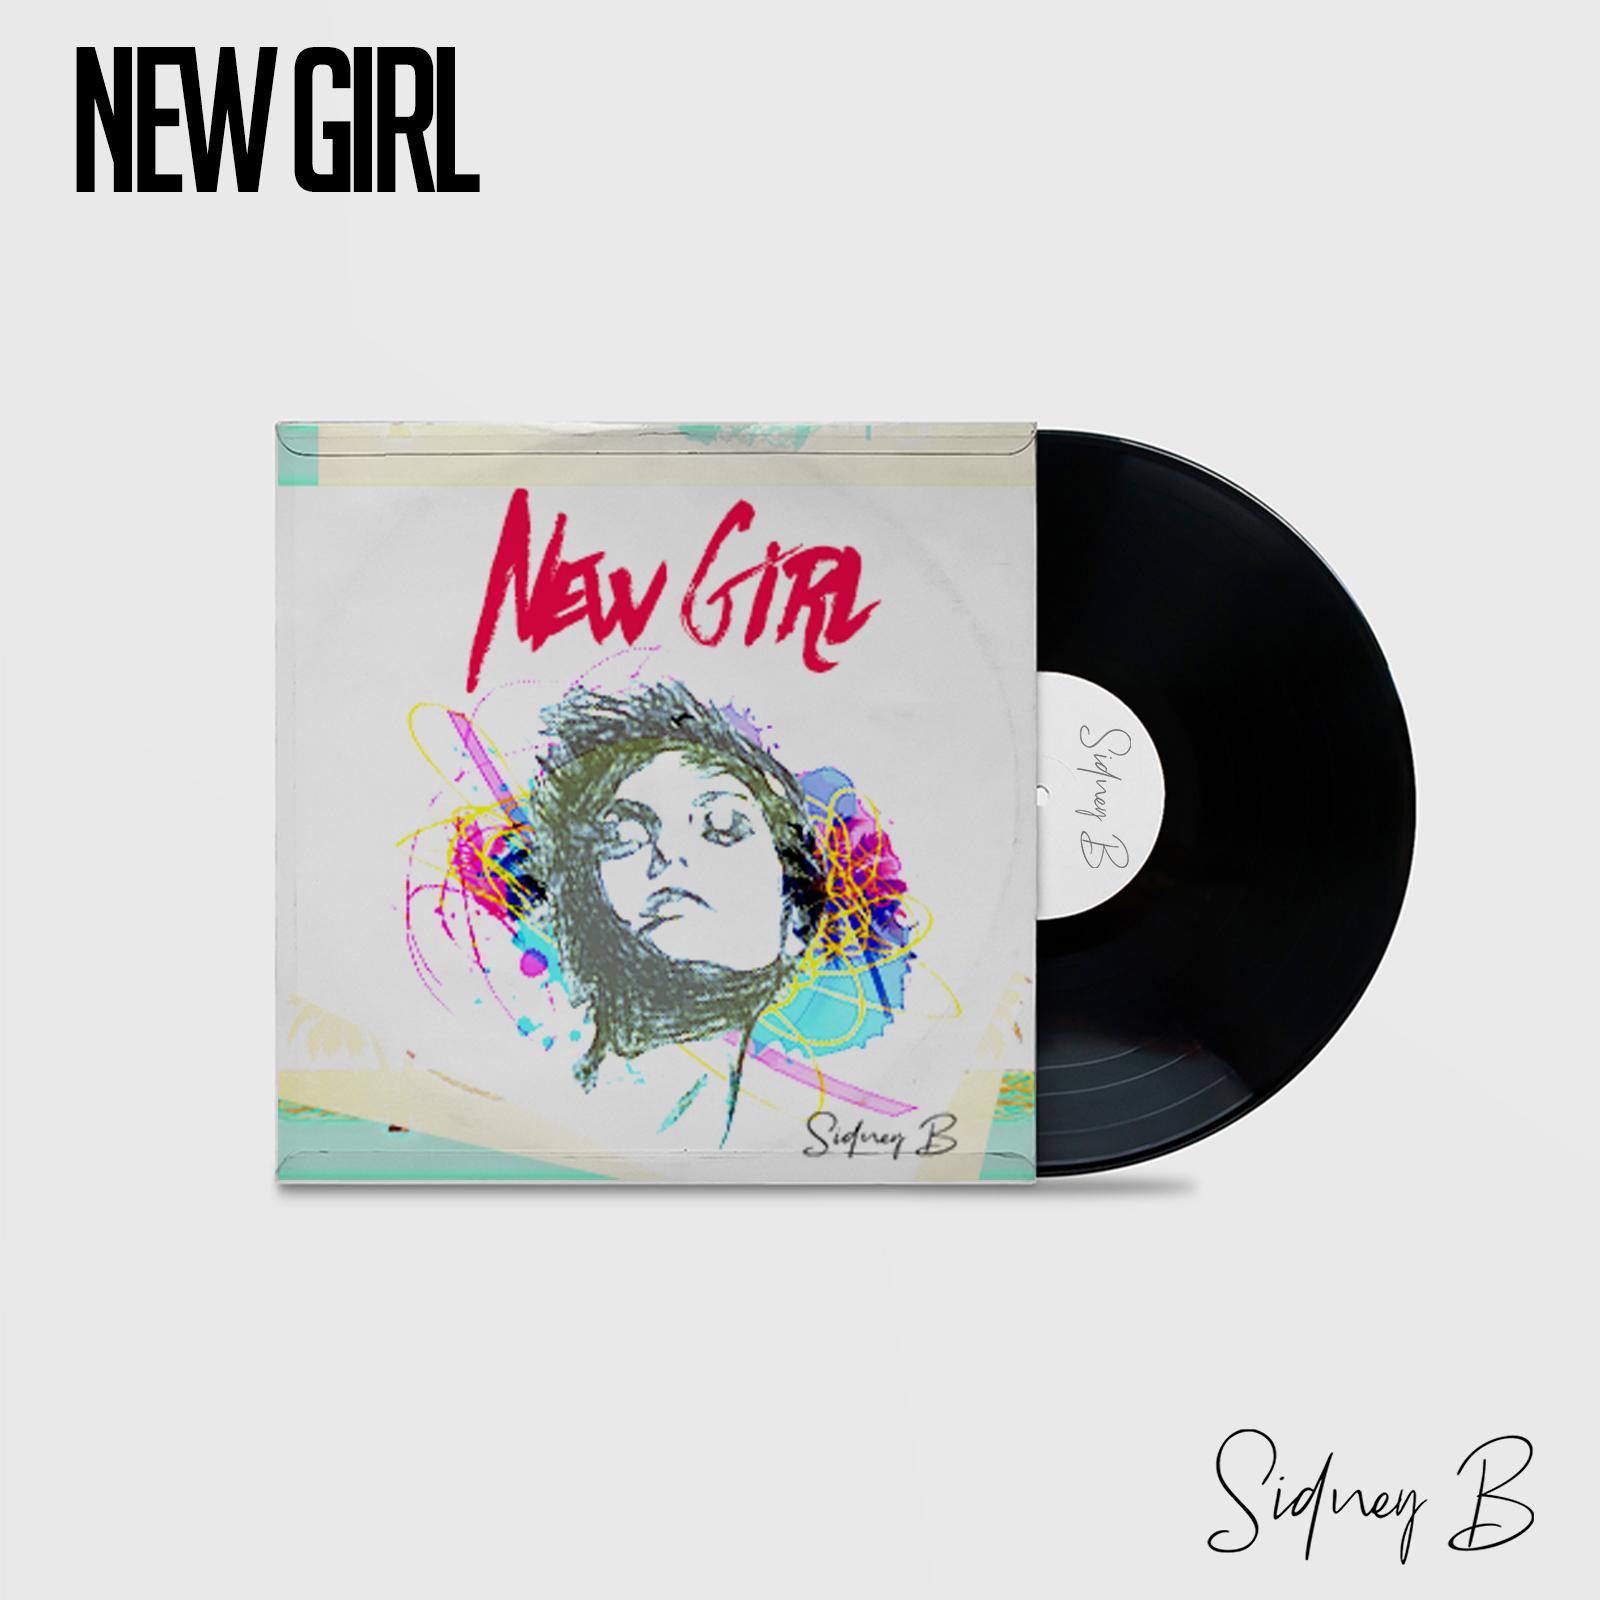 New Girl Image